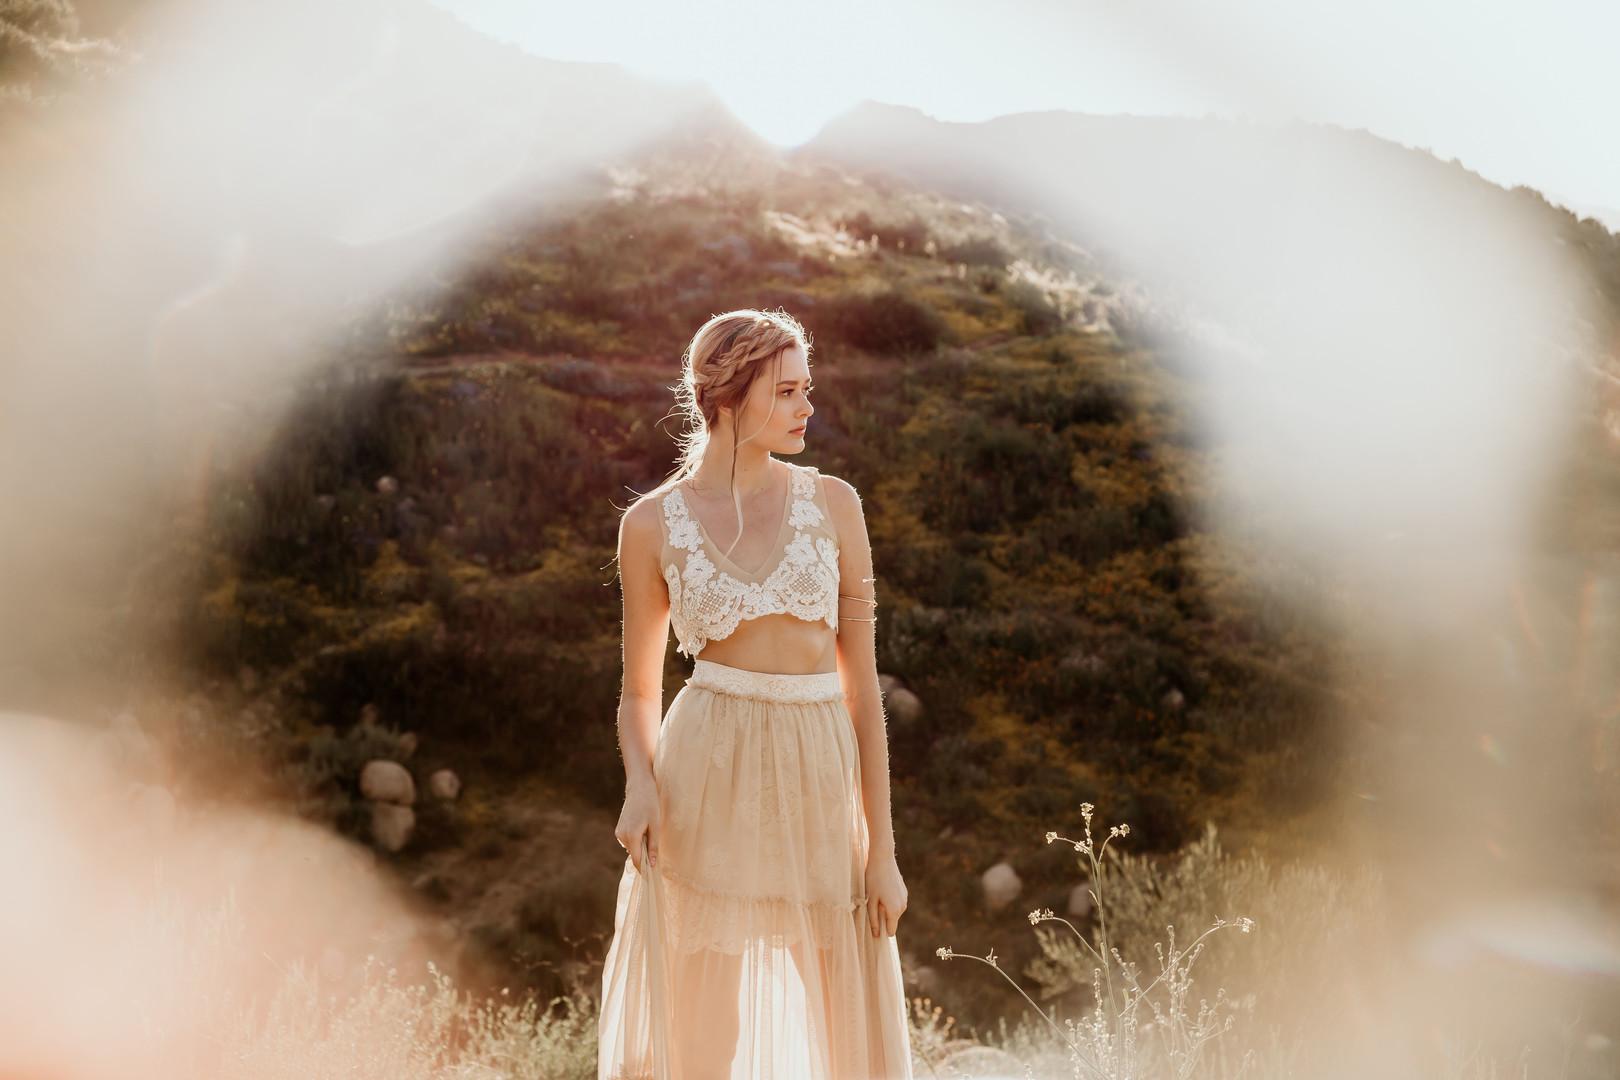 MelissaFeChapmanPhotography_PoppyfieldsbridalsessionwithBrookebyMelissaFeChapmanPhotography3281912_big.jpg